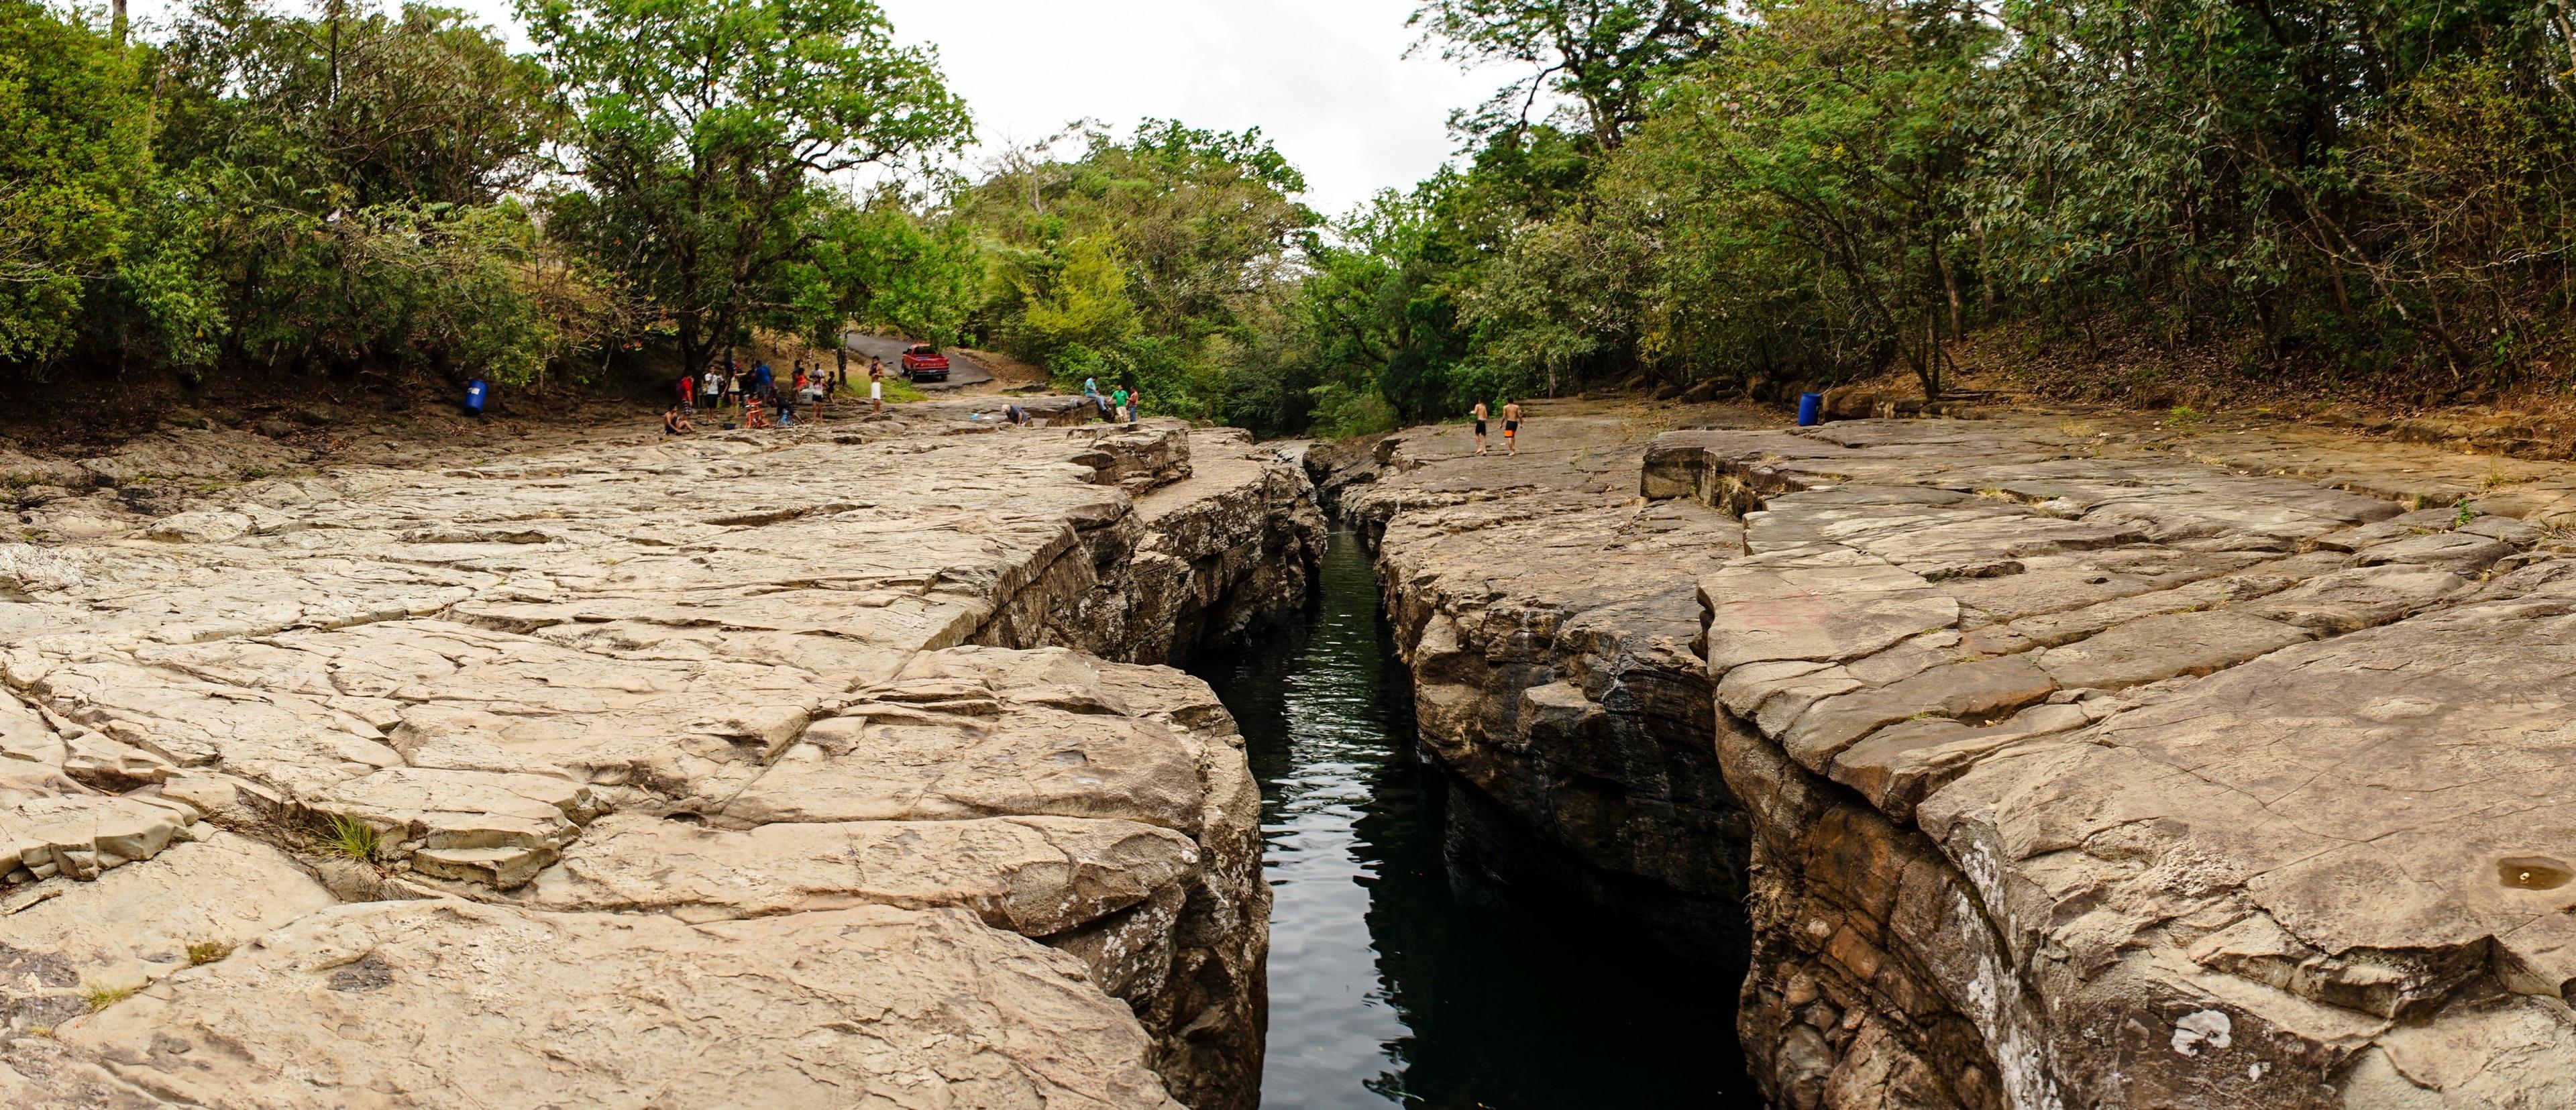 David, Chiriquí (Provinz), Panama